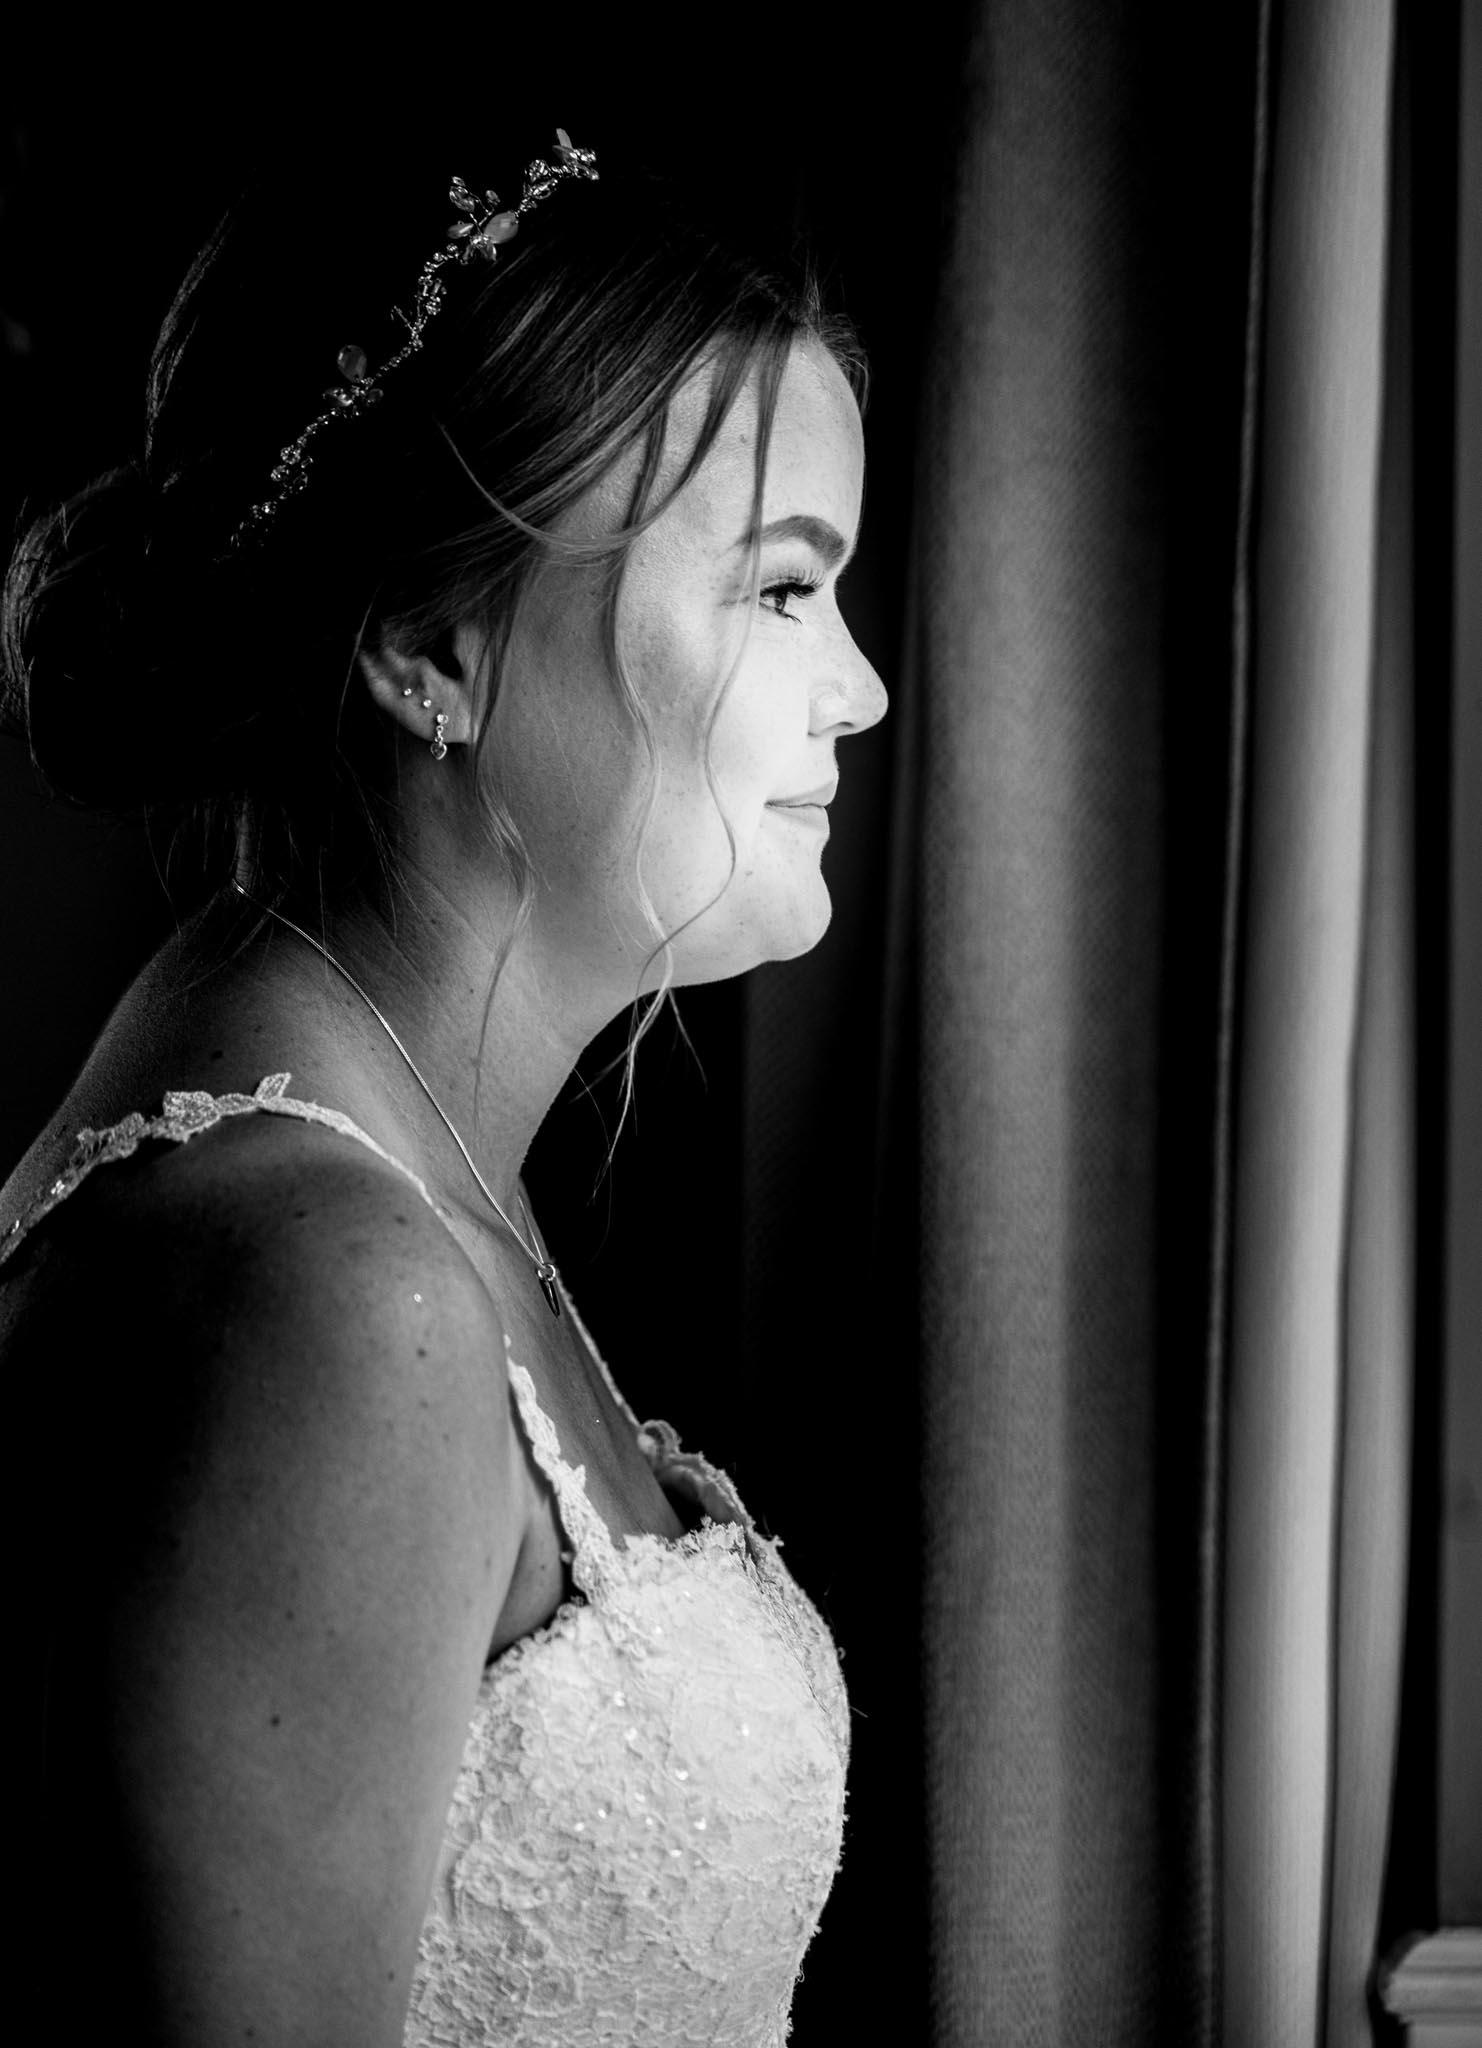 140-Preparations-Luke-Yasmin-The-Rayleigh-Club-Wedding-Photography.jpg